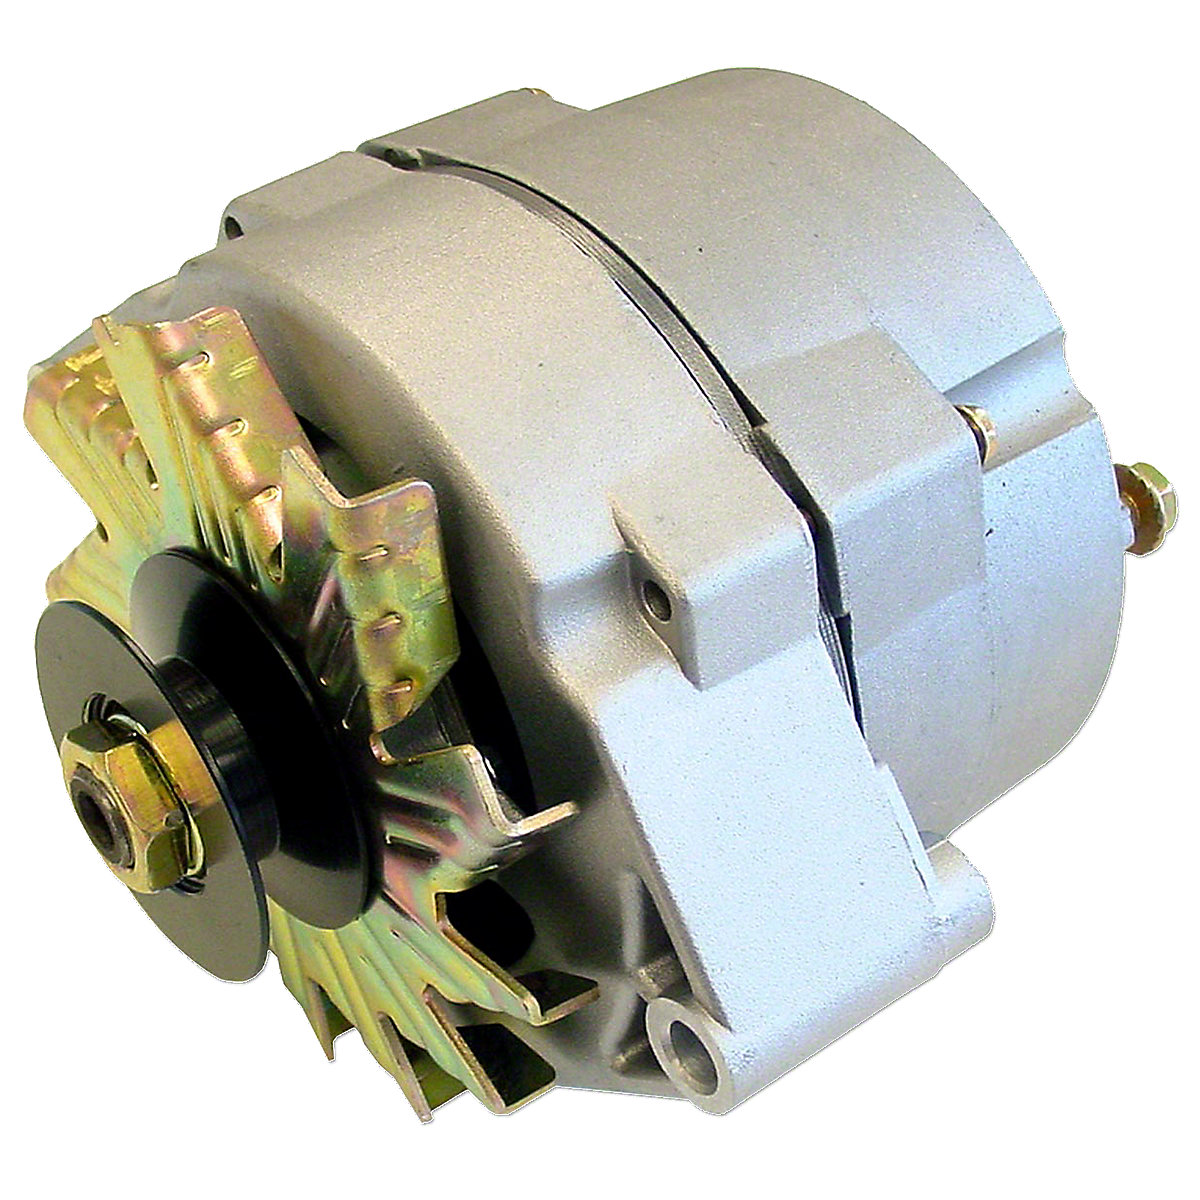 12 Volt 63 Amp 1 Wire Alternator For Converting 6 Volt to 12 Volt.